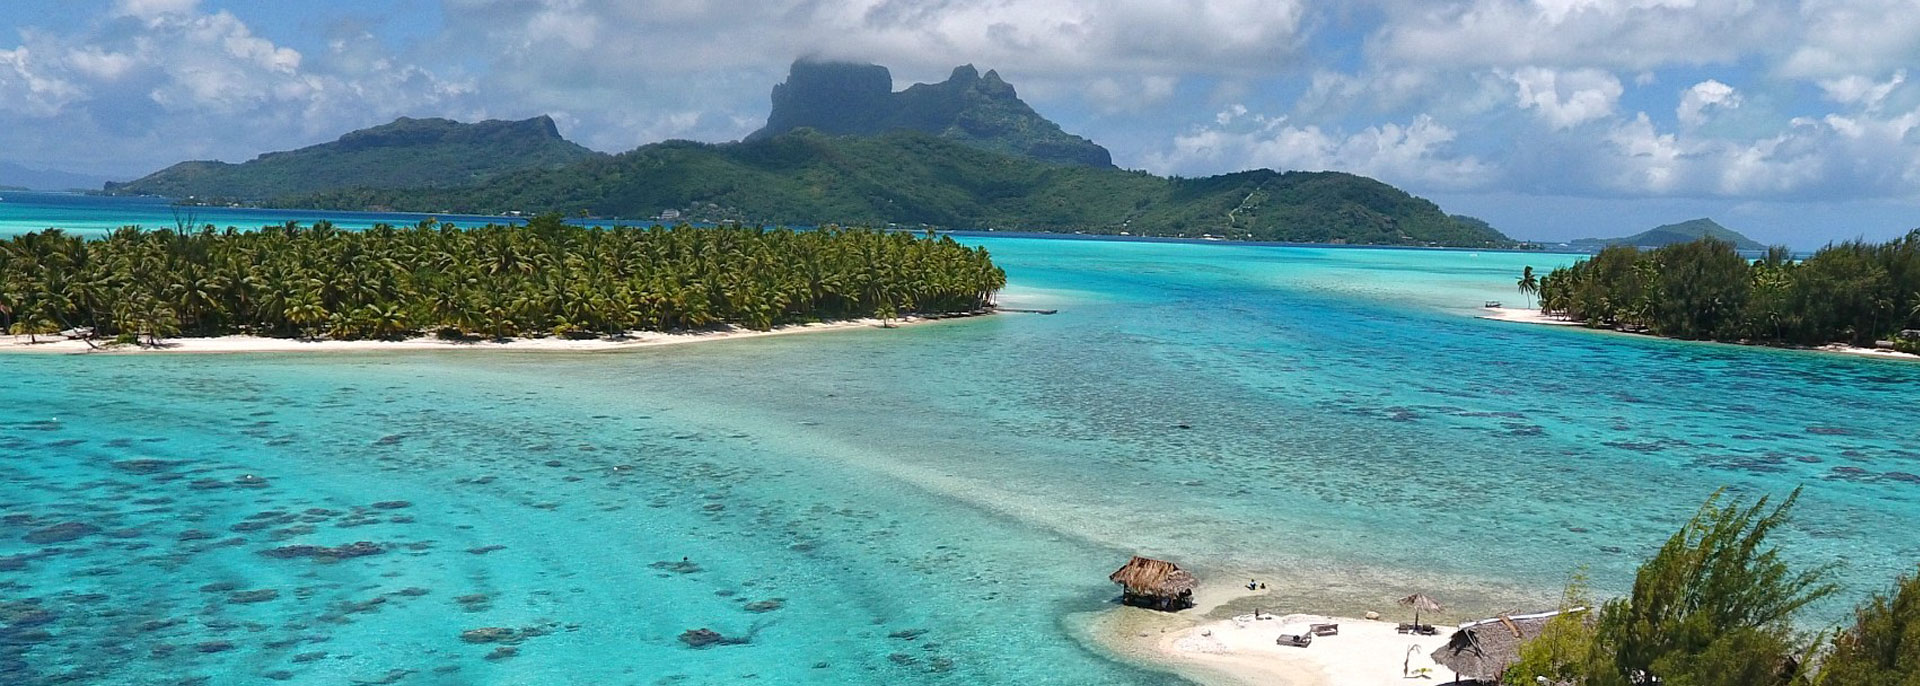 Ilôt privé de Bora Bora